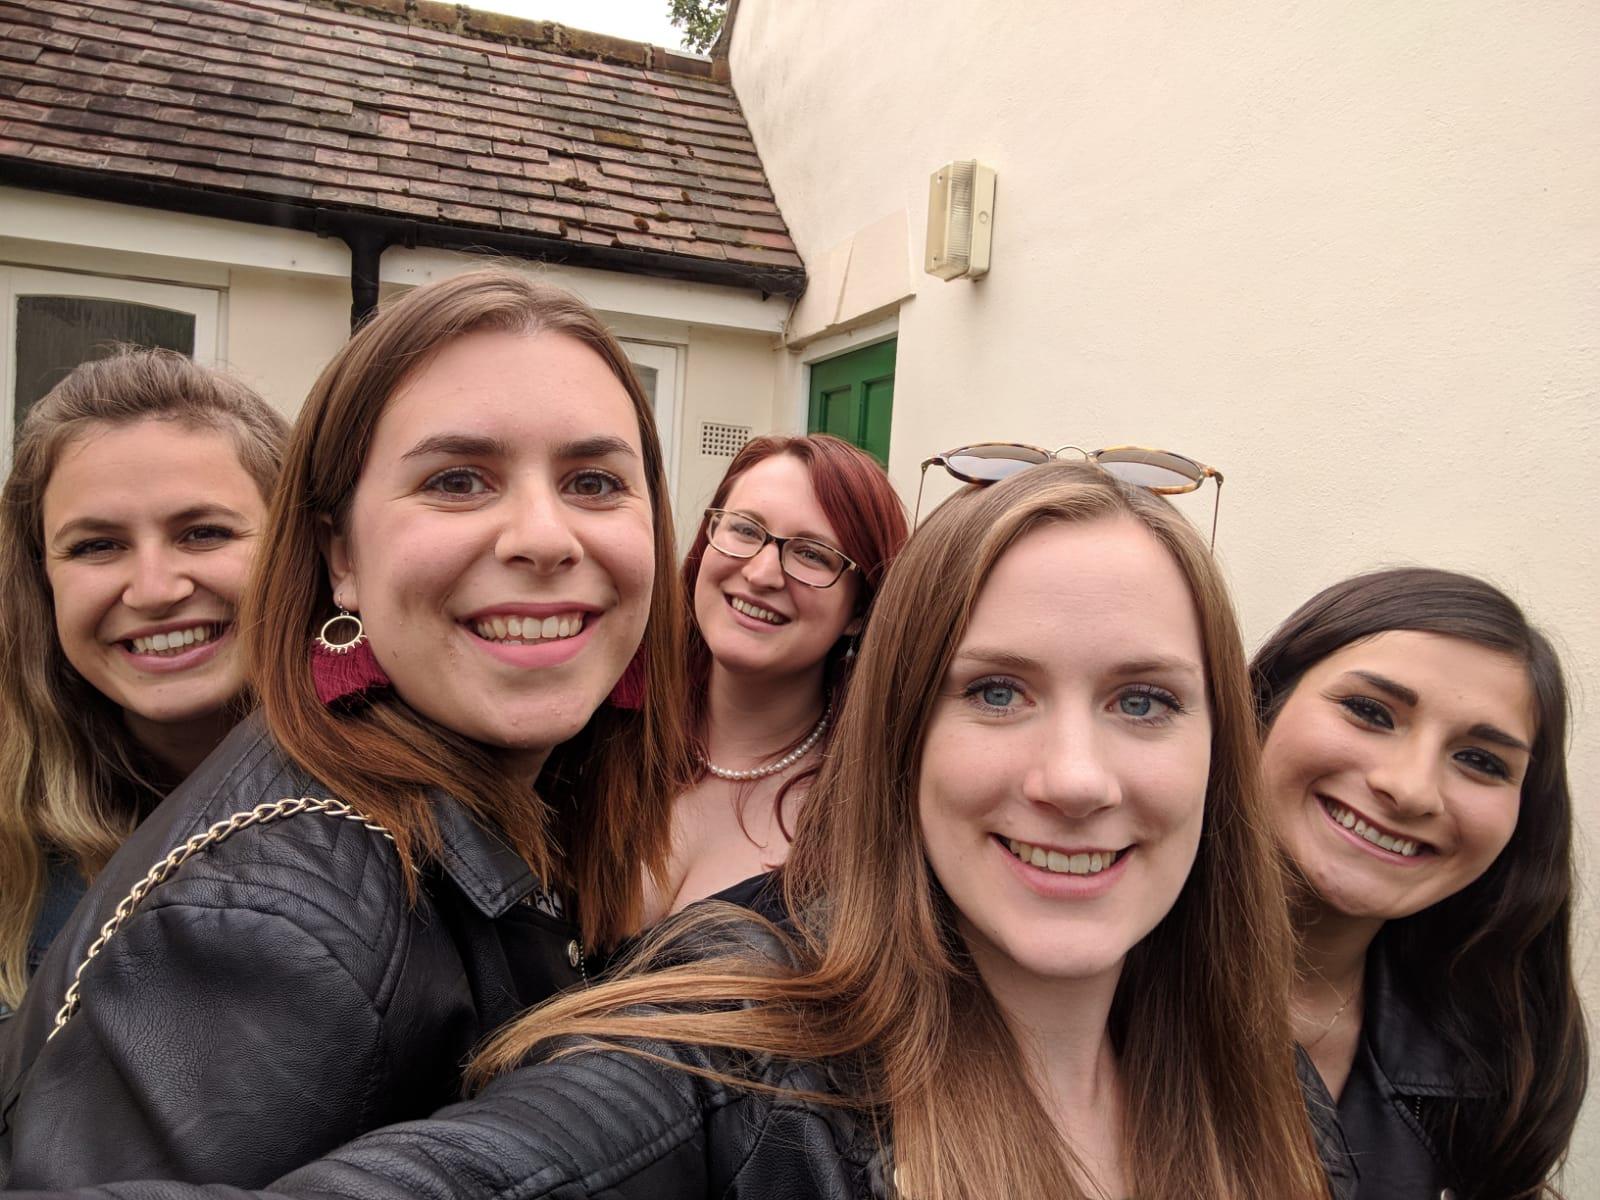 Visiting St Albans